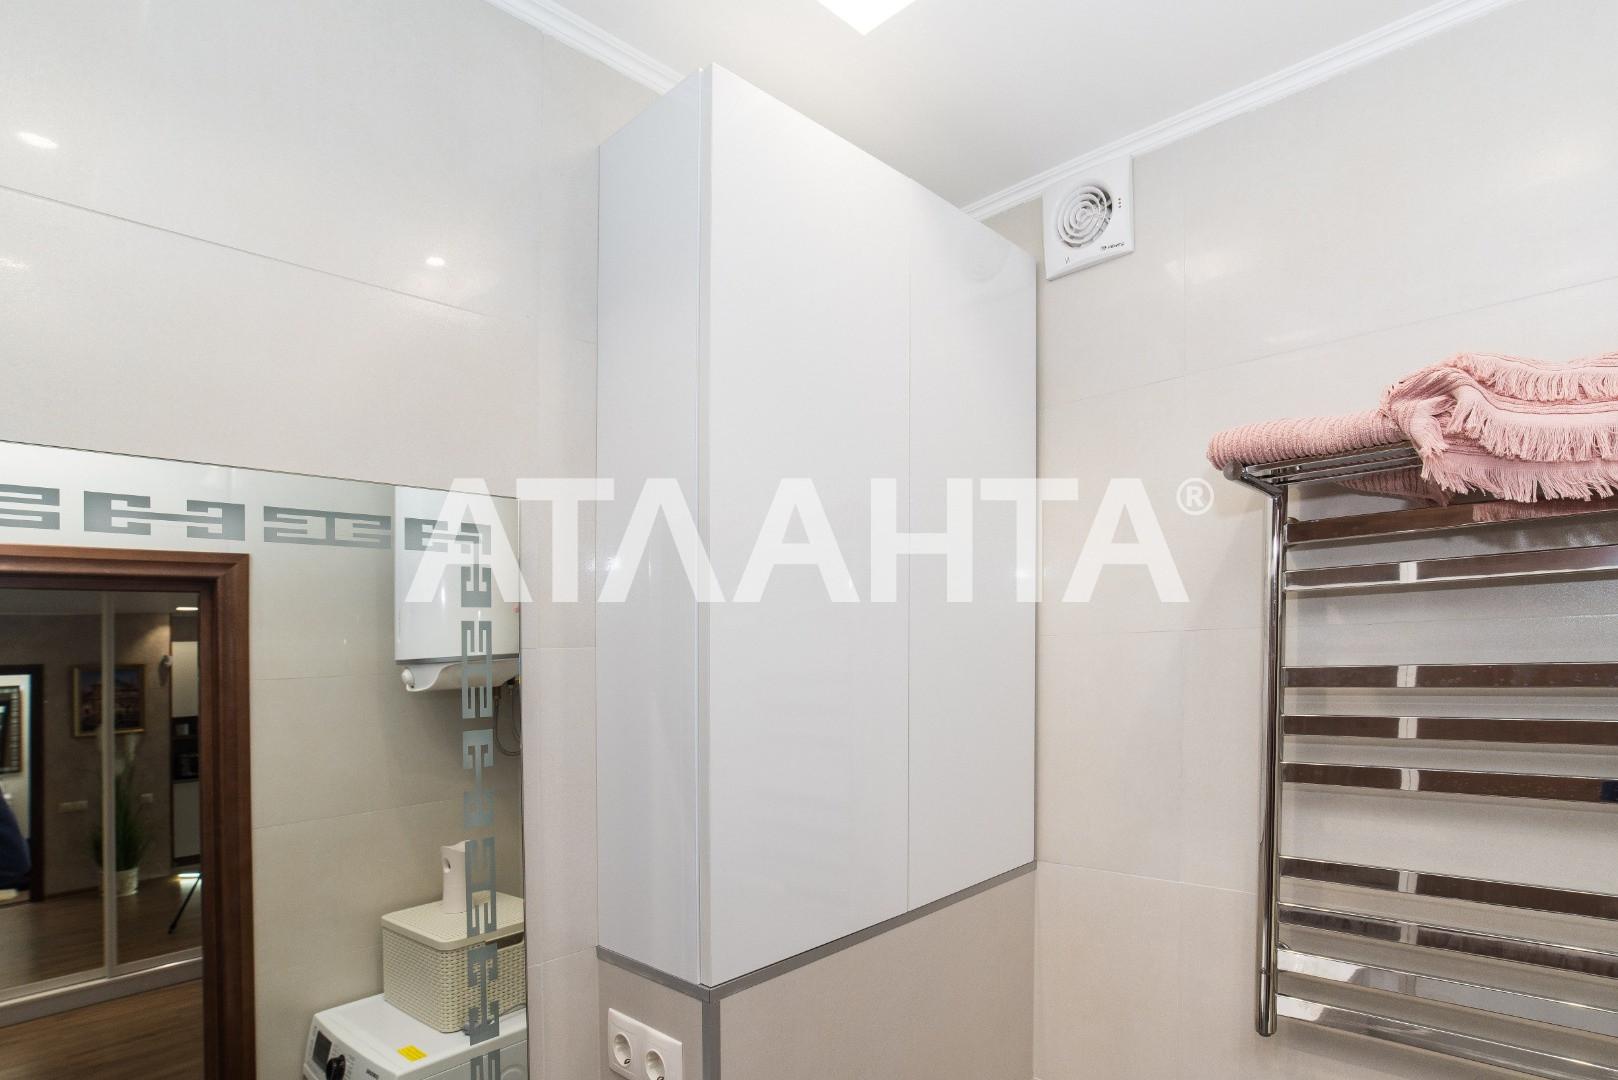 Продается 1-комнатная Квартира на ул. Балковская (Фрунзе) — 50 000 у.е. (фото №24)